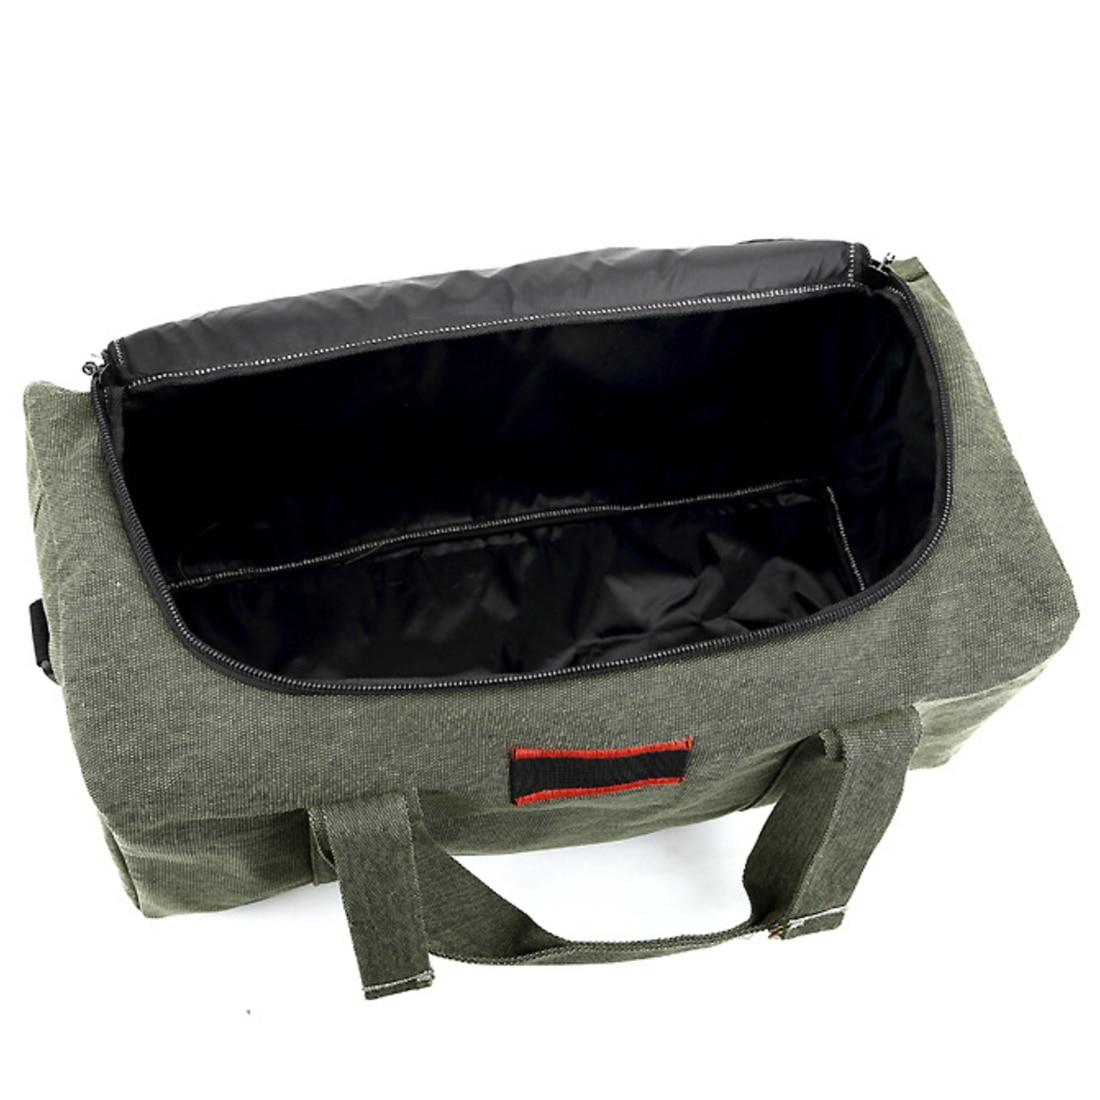 HIPSTEEN Large Capacity Canvas Men's Women Travel Bags Cross-body Bag Handbag Luggage Bag Men Travel Bags - Size S / L Hot Sale 9